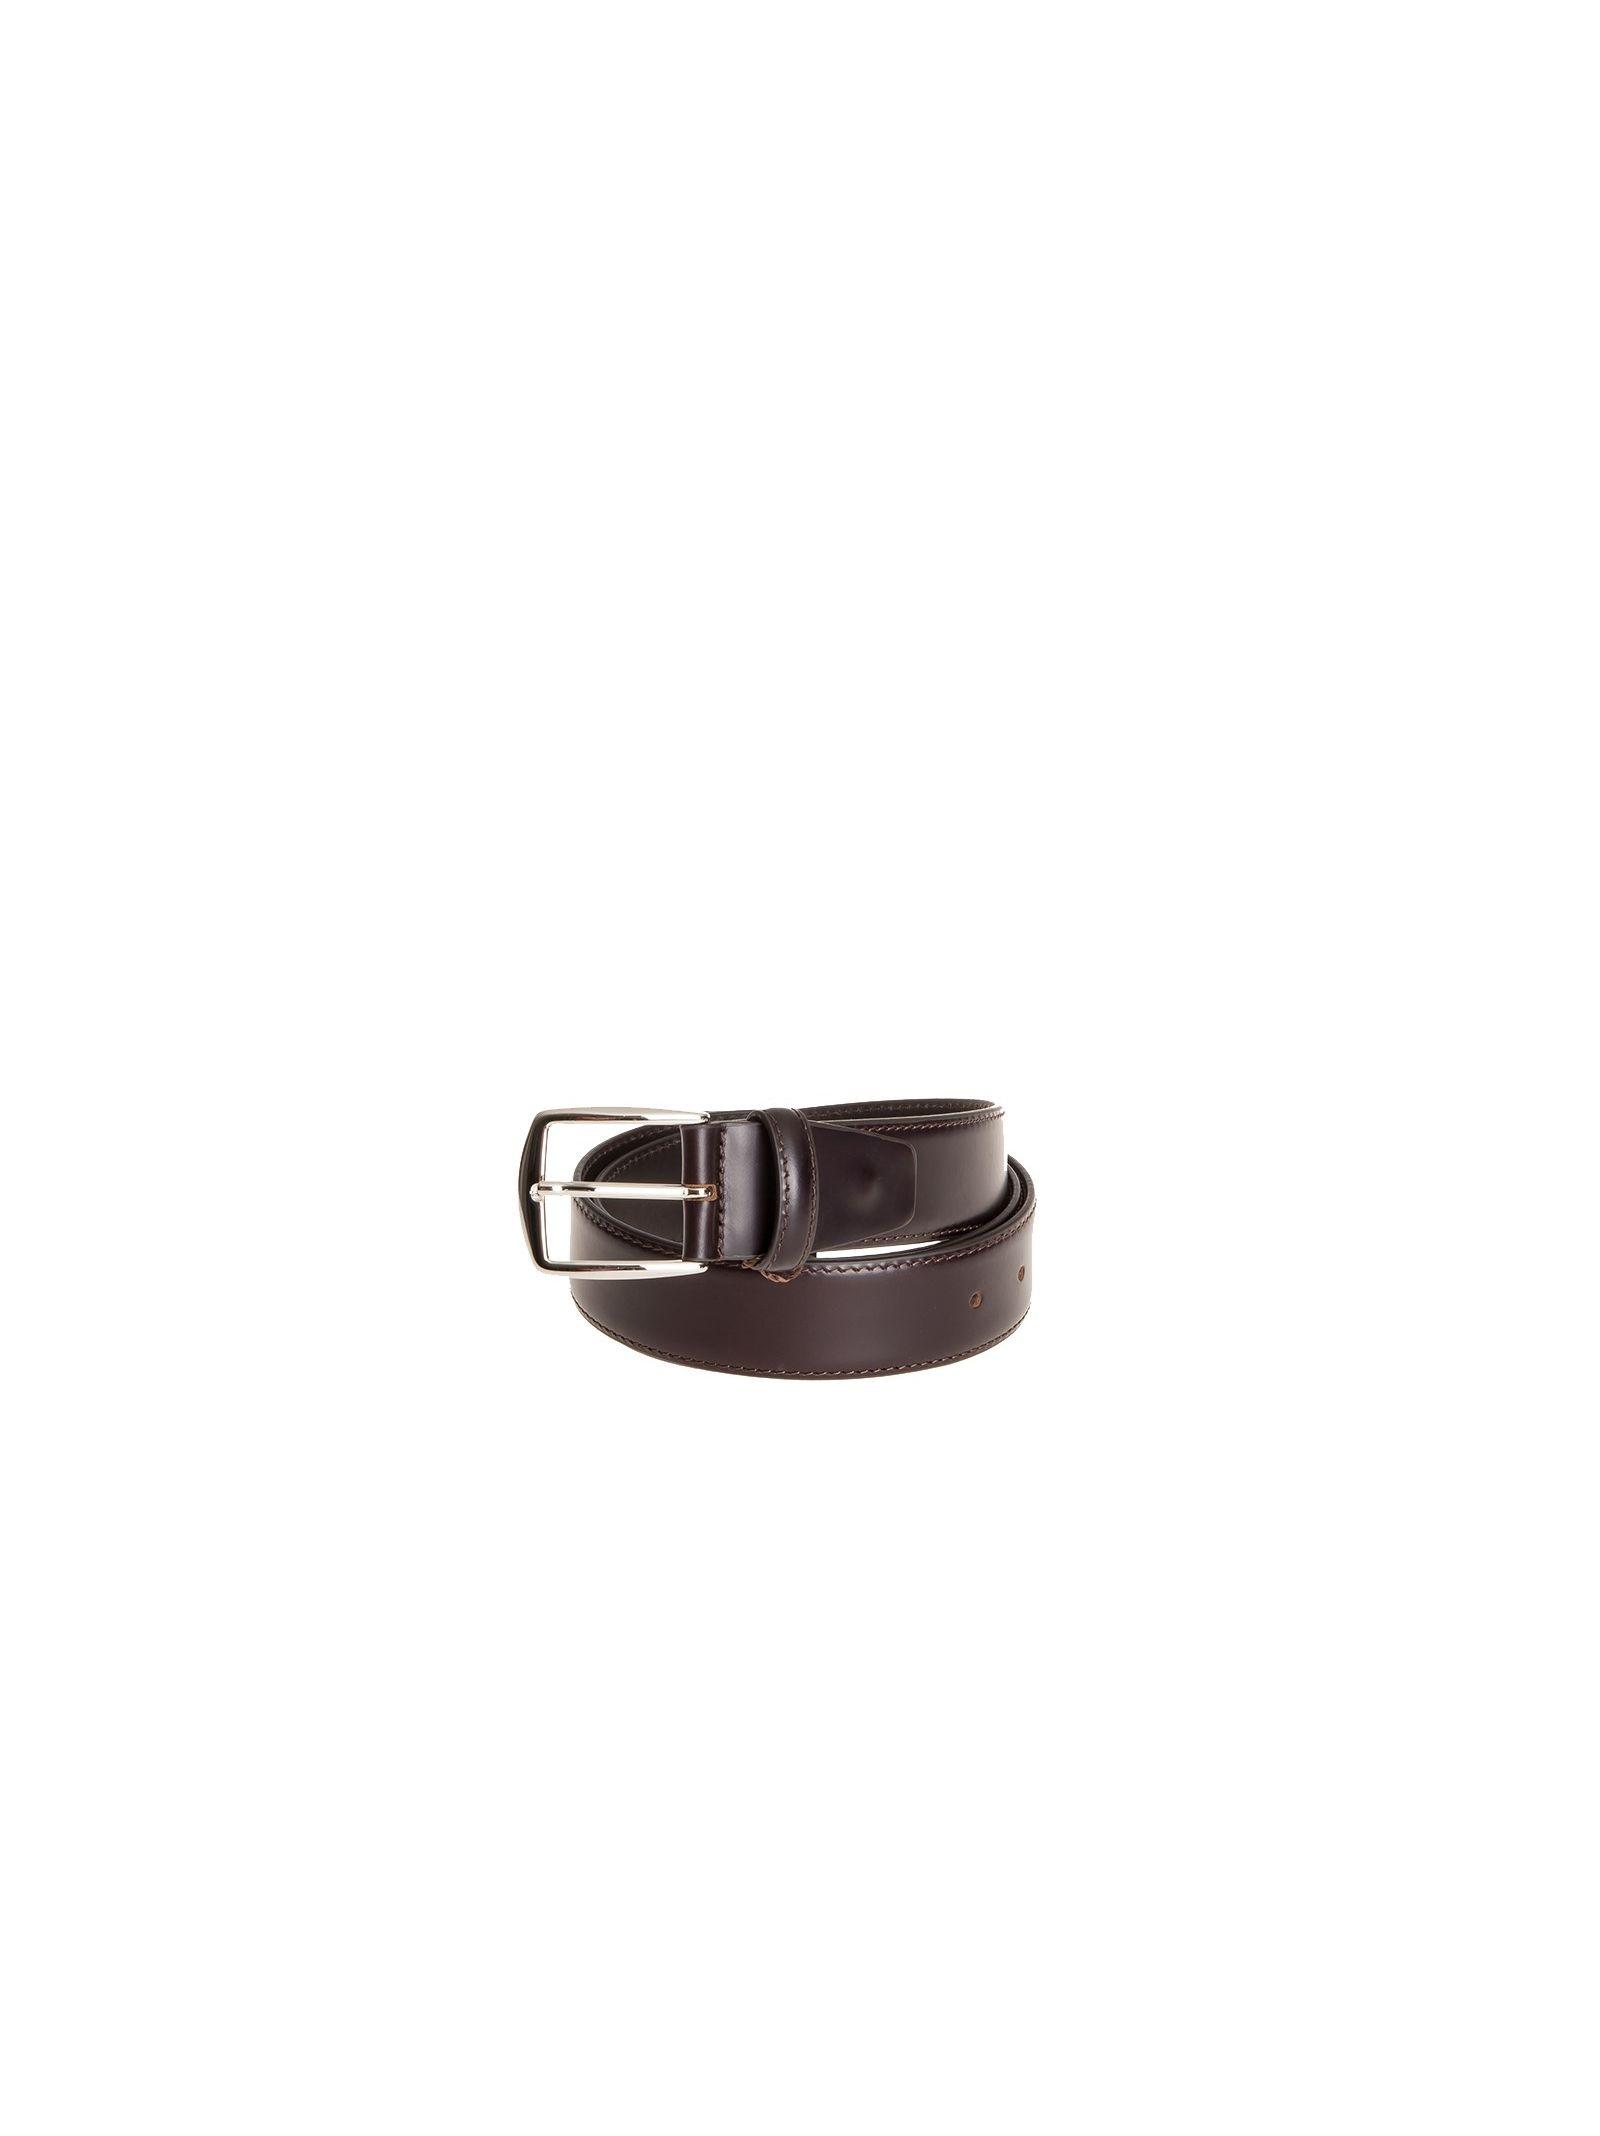 Leather Belt Andrea D'amico Acub071 497